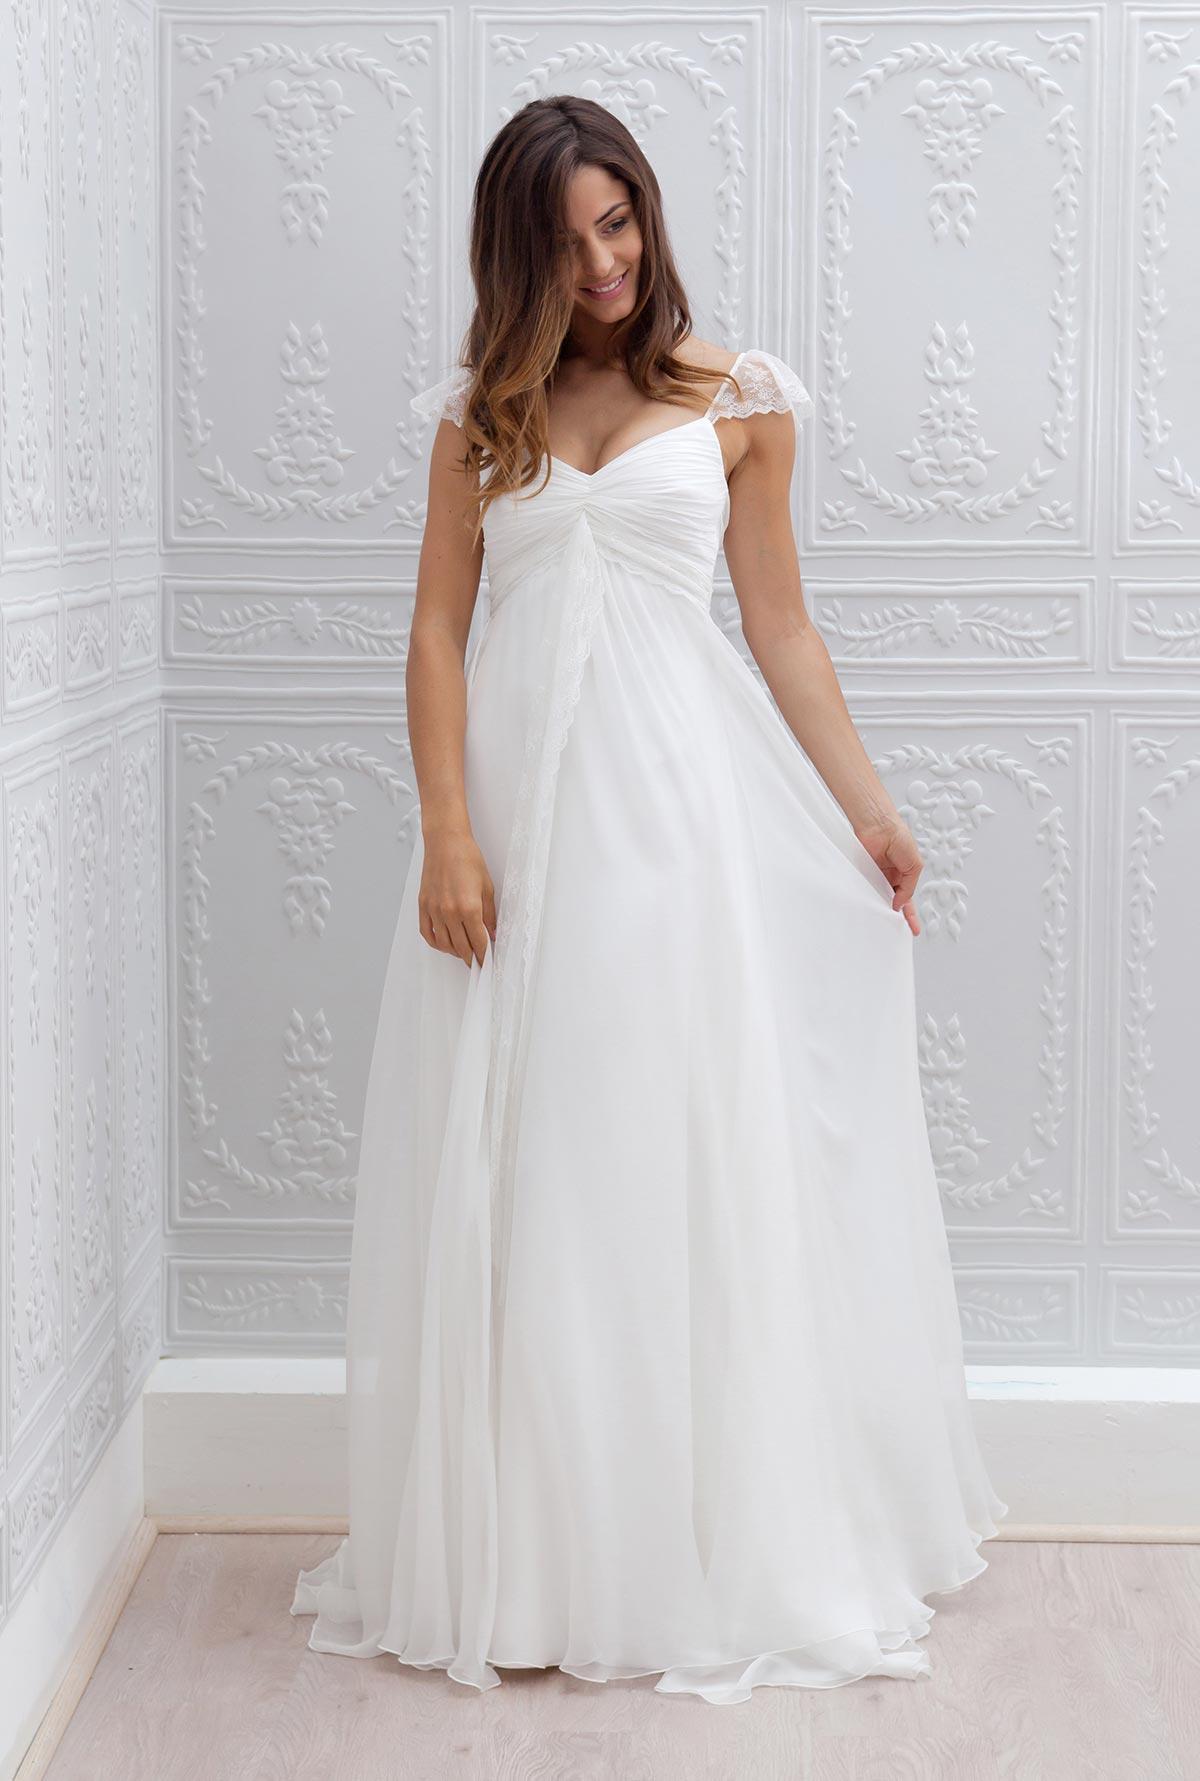 c1a5050c101 Vestidos de novia para embarazadas - ¡Modelos preciosos!